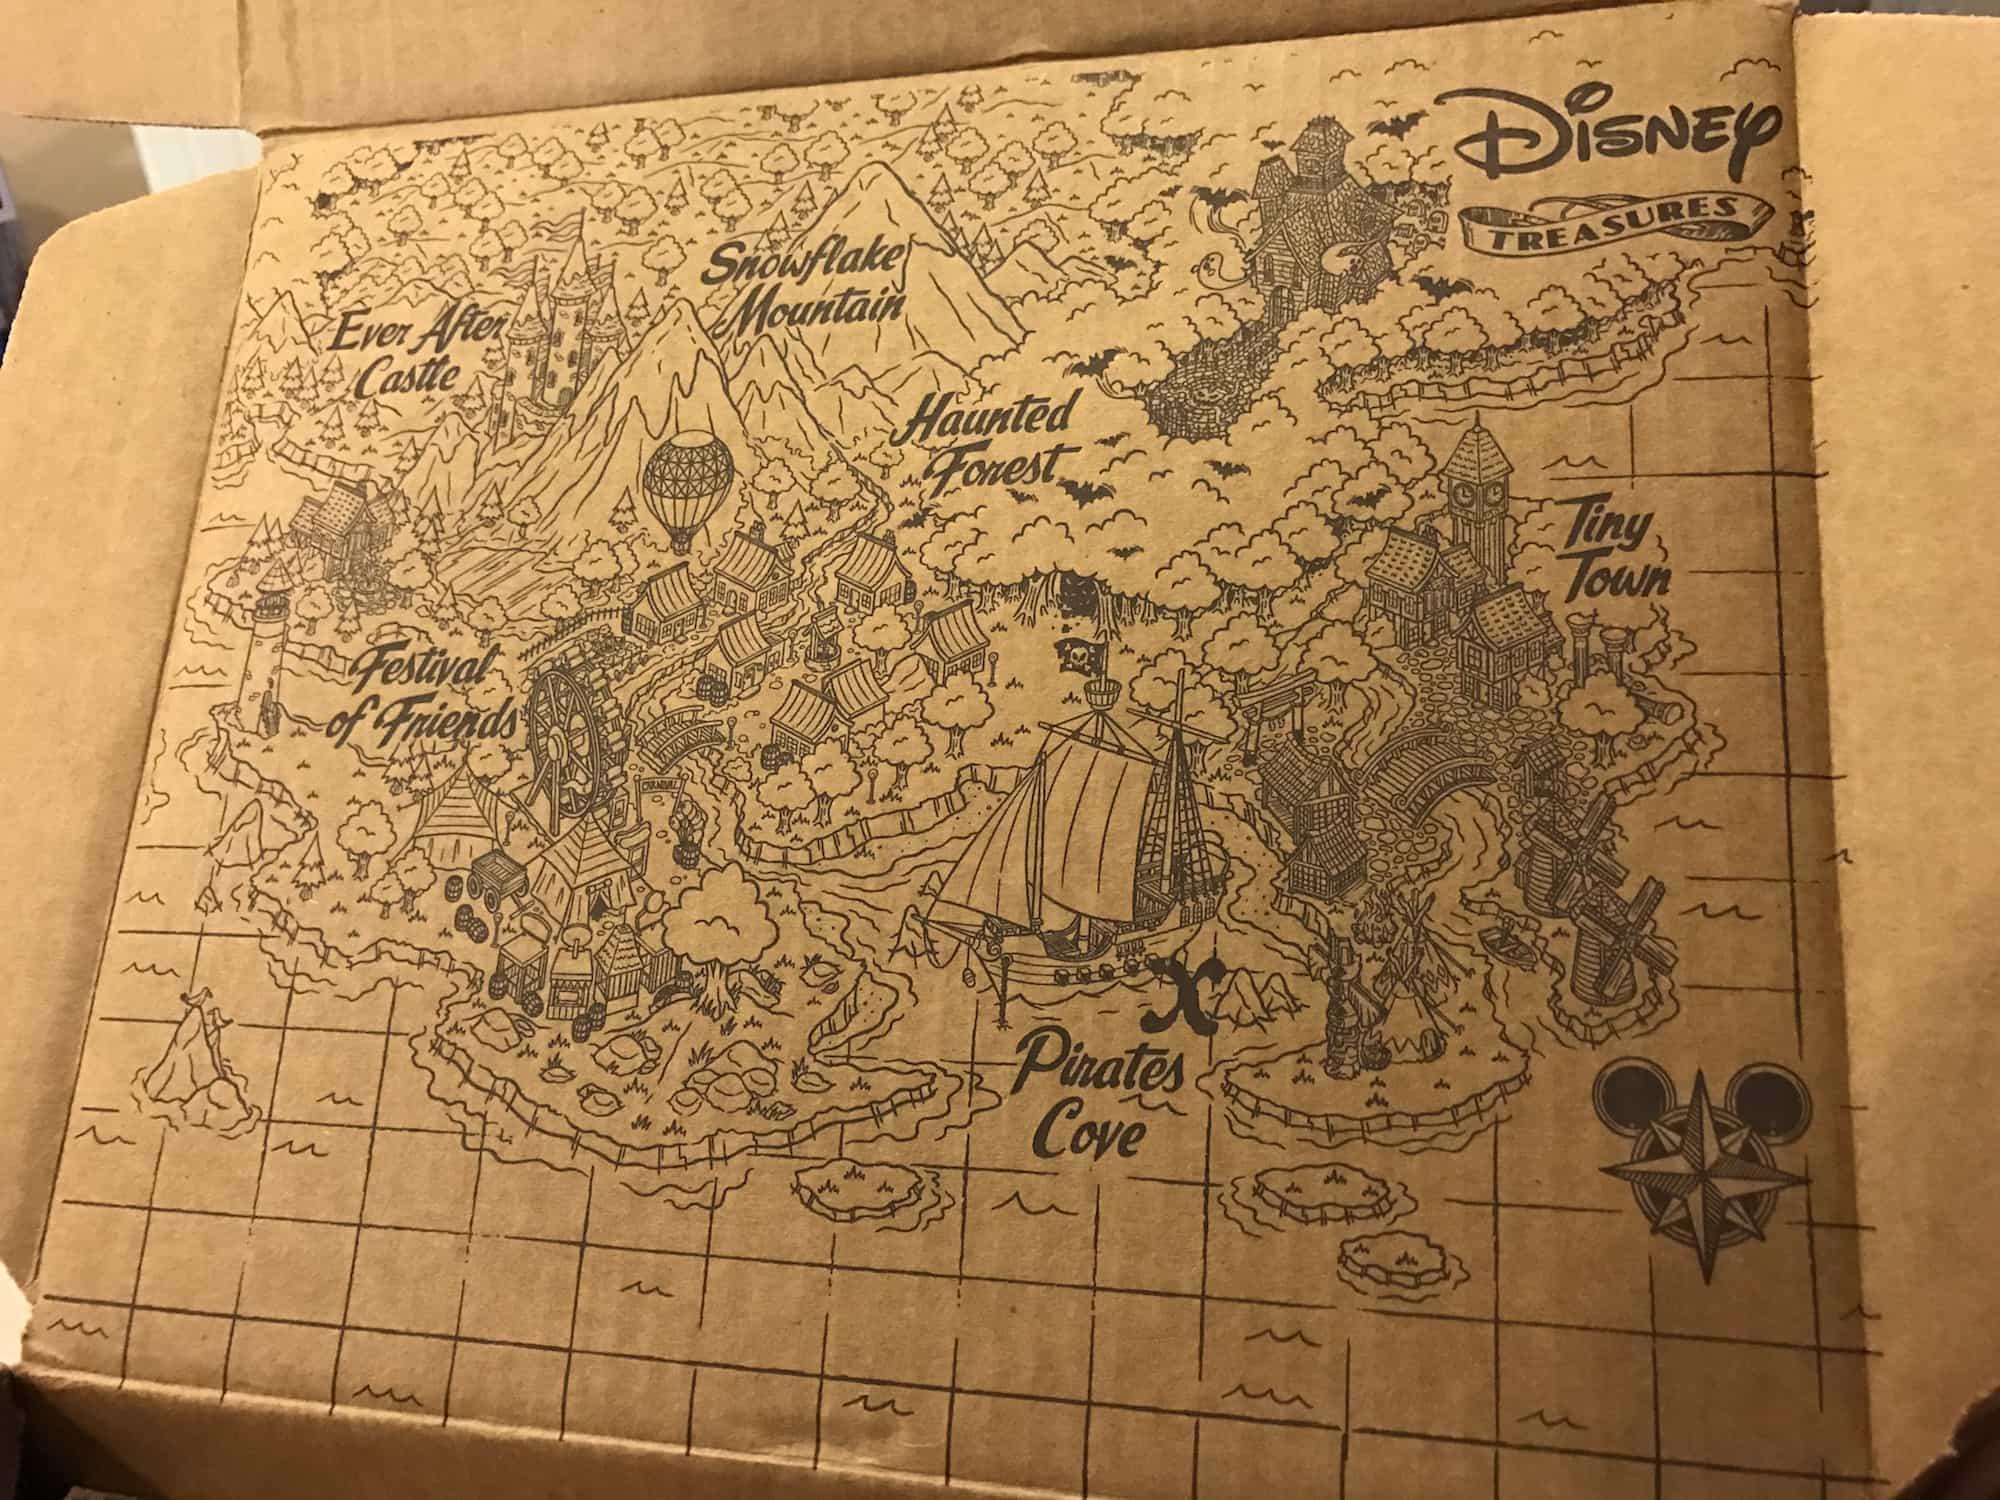 Sticker unboxing - Disney Treasures April 2017 Unboxing Pirates Cove